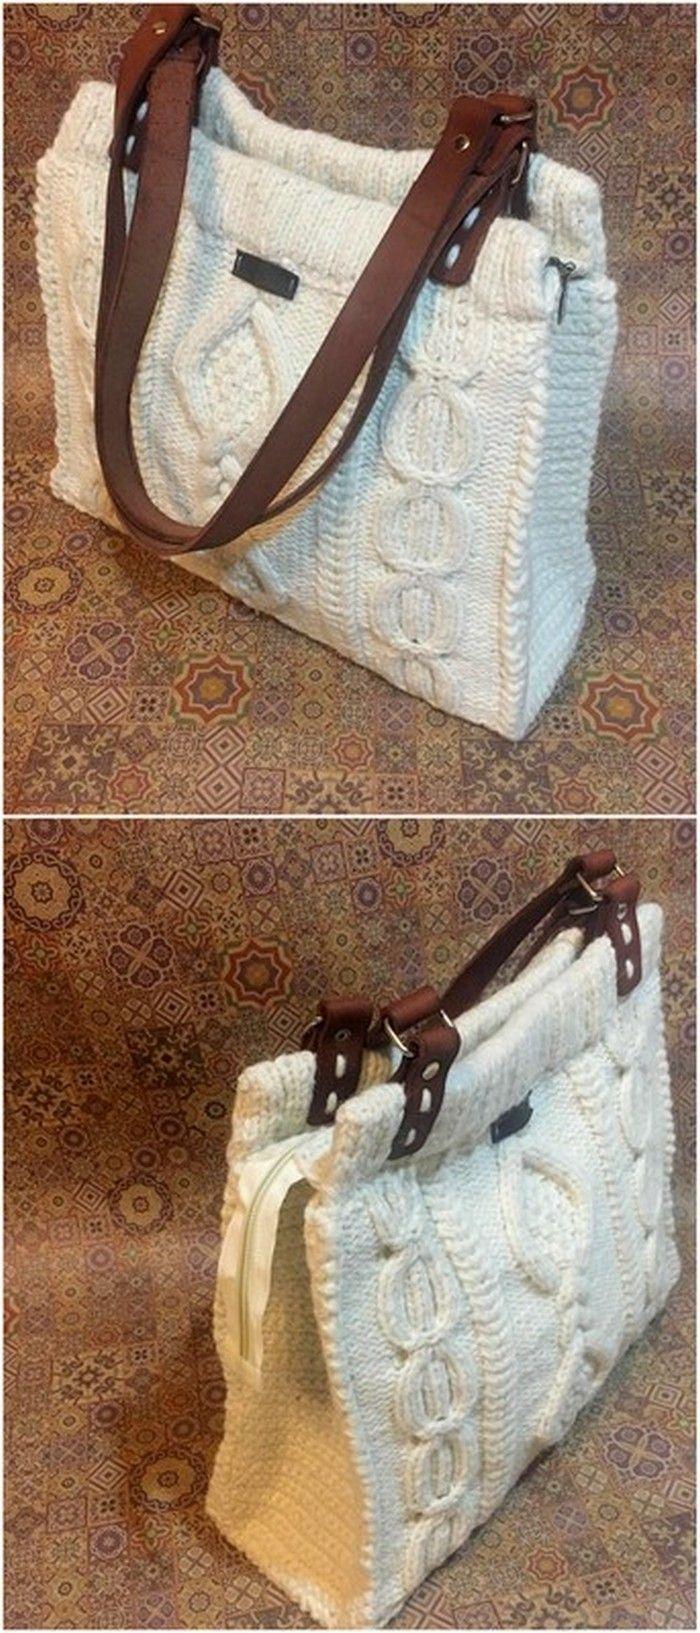 Unique Designs of Amazing Crochet Handbag & Accessories – Diy Rustics